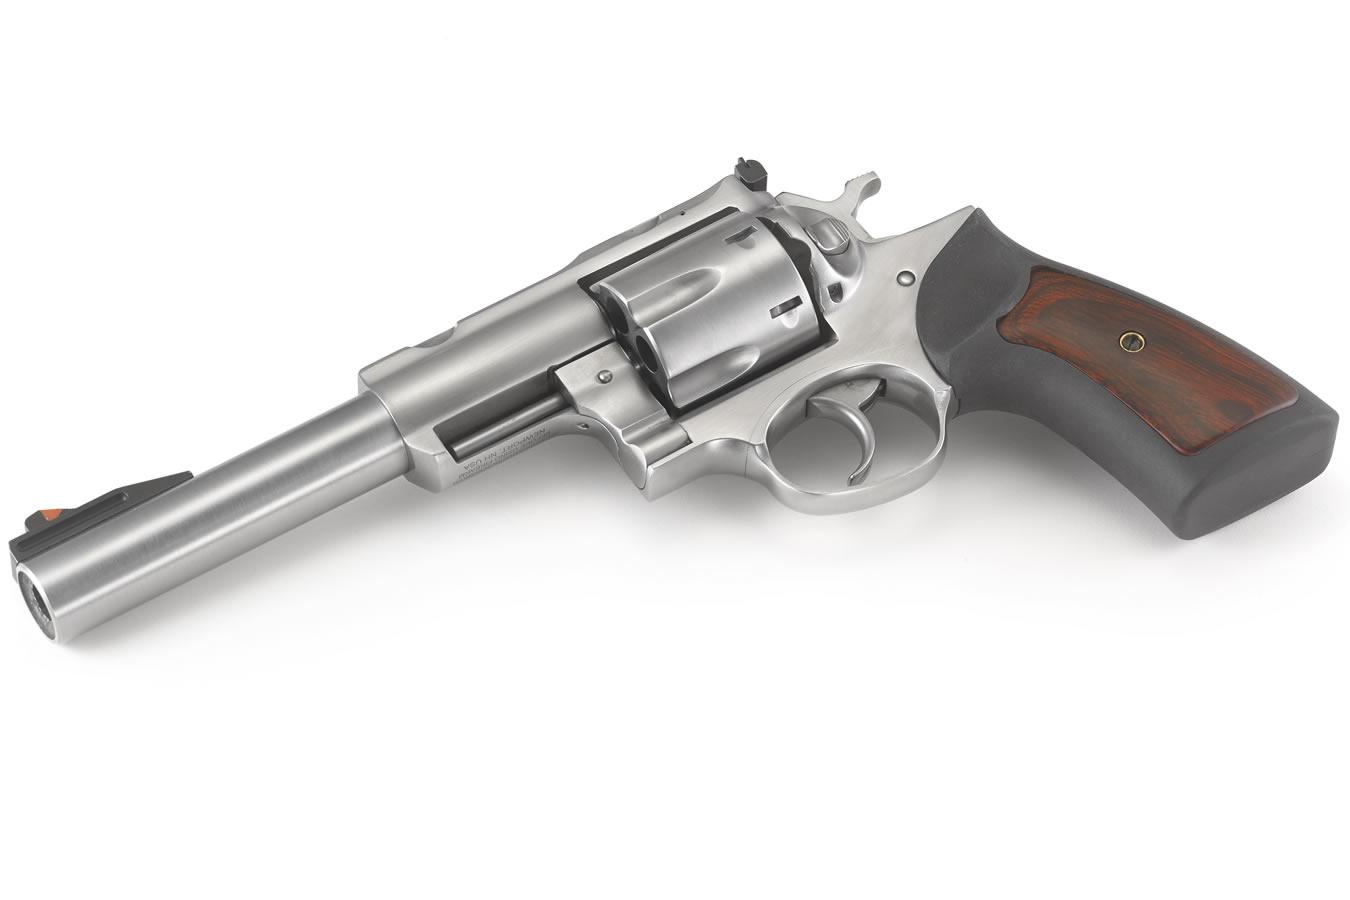 Super Redhawk 10mm Auto Double-Action Revolver